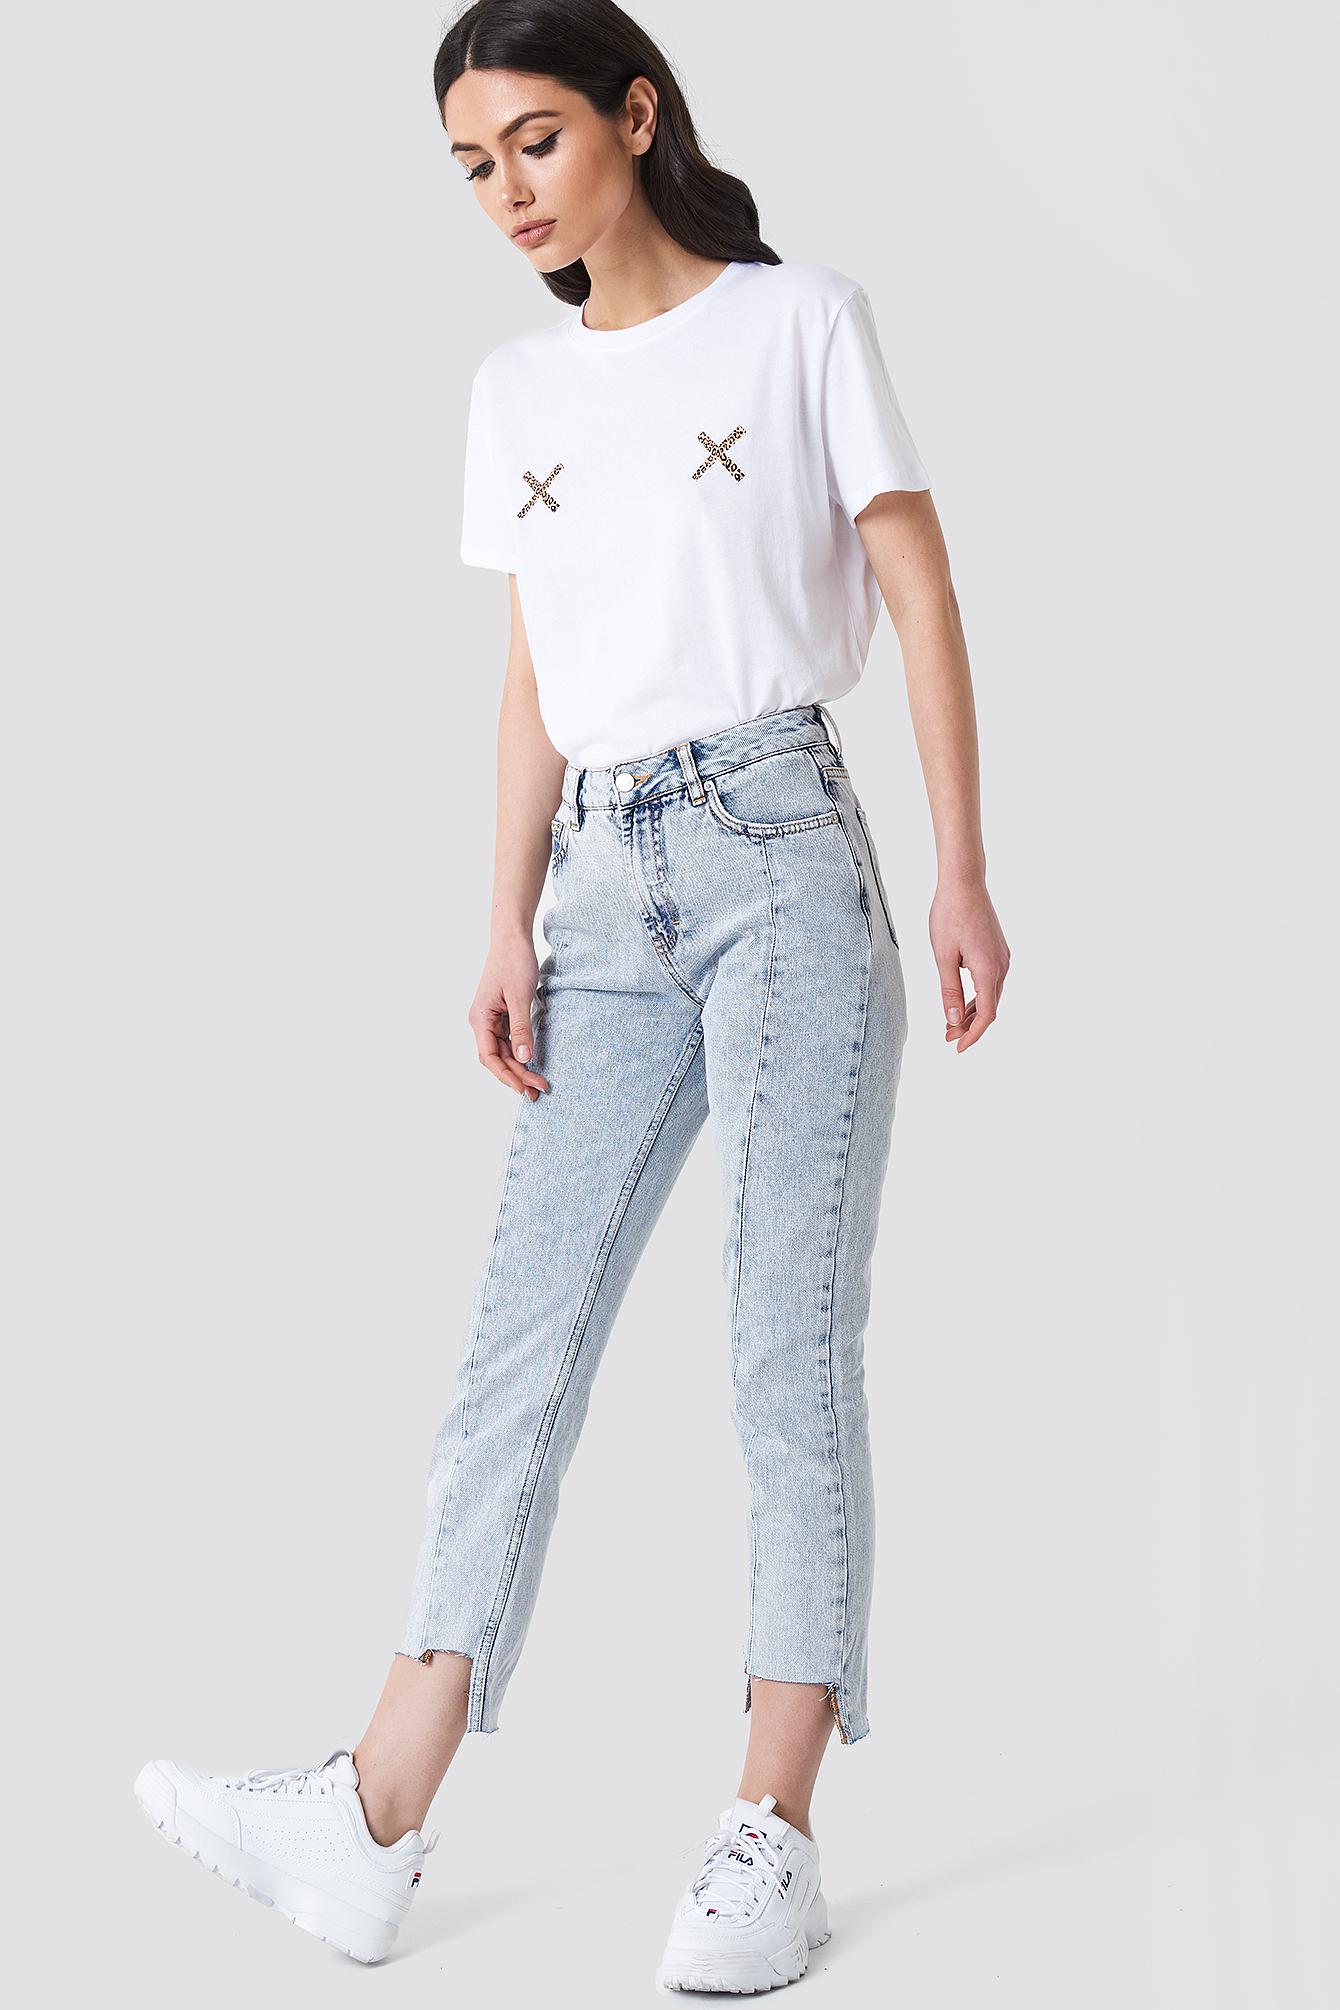 Koszulka Double X NA-KD.COM